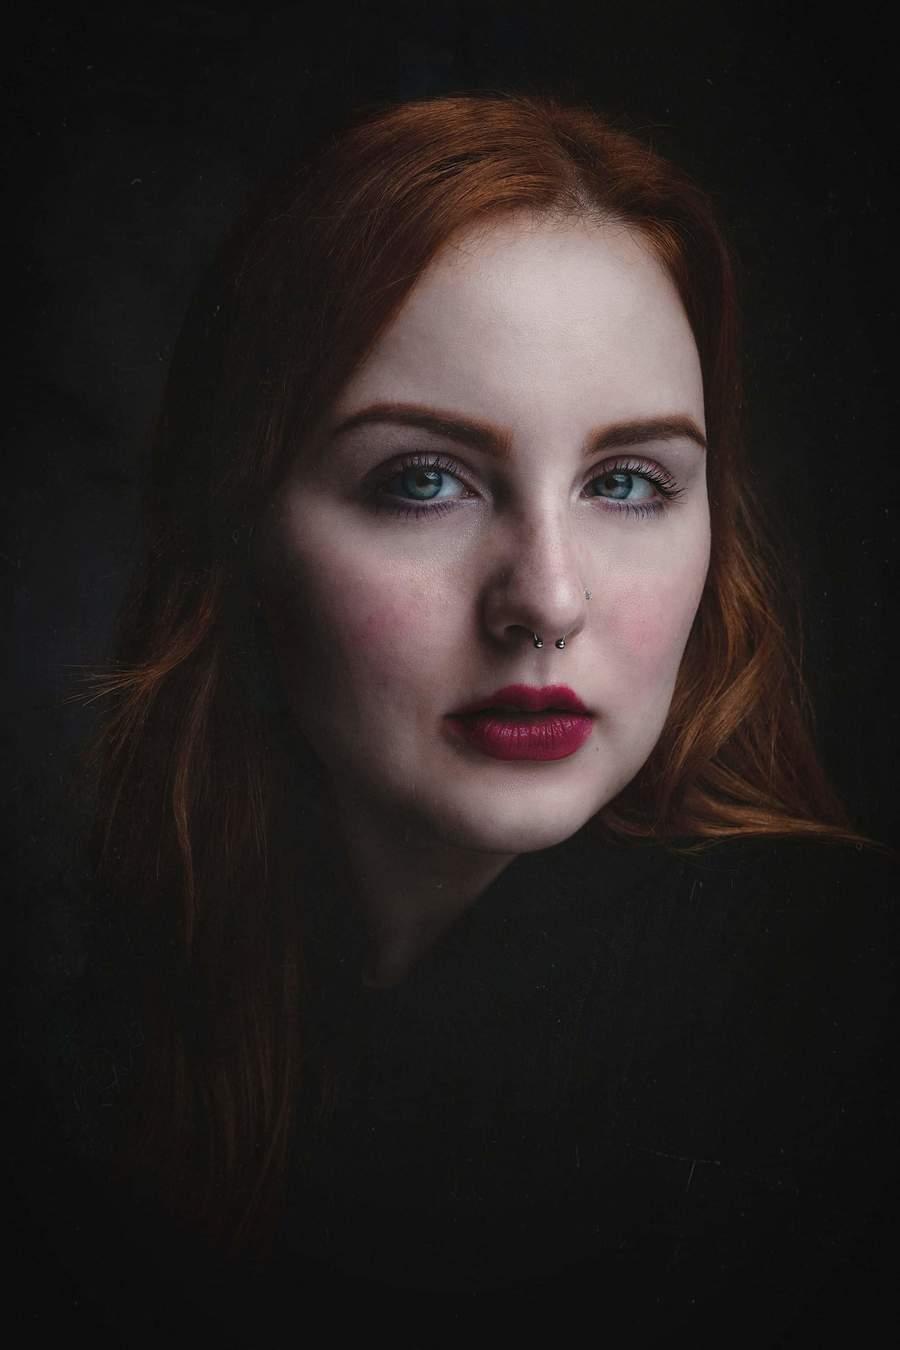 Portrait / Photography by Darryl J Dennis, Model Leigh_Anne, Post processing by Darryl J Dennis, Taken at Big Shot Studio / Uploaded 29th November 2018 @ 08:16 PM